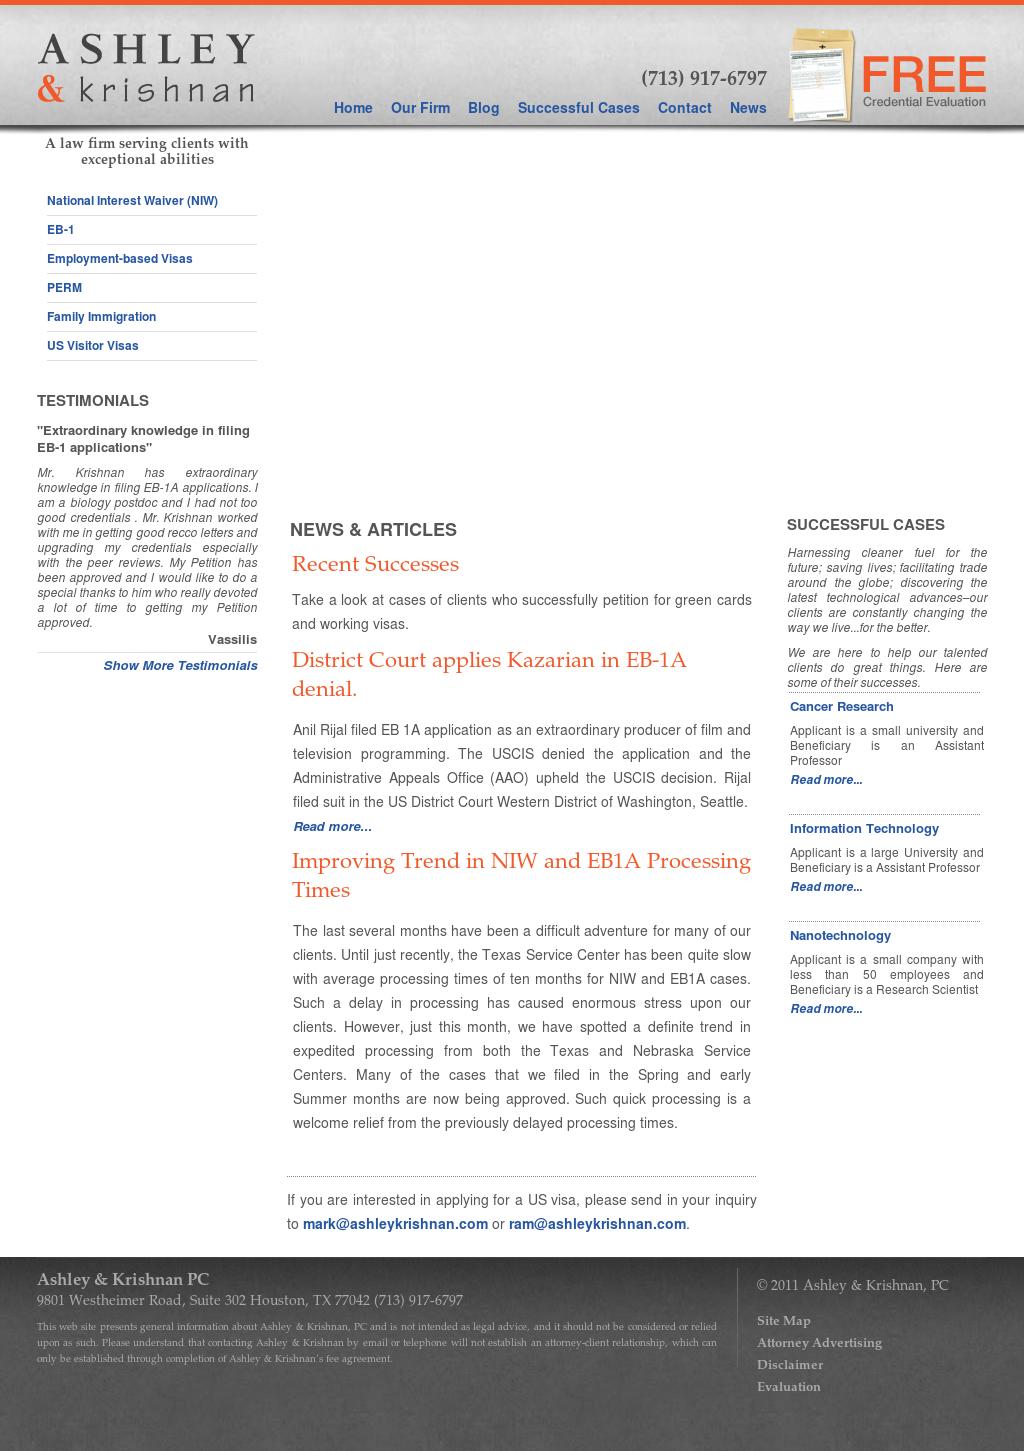 Ashley & Krishnan Competitors, Revenue and Employees - Owler